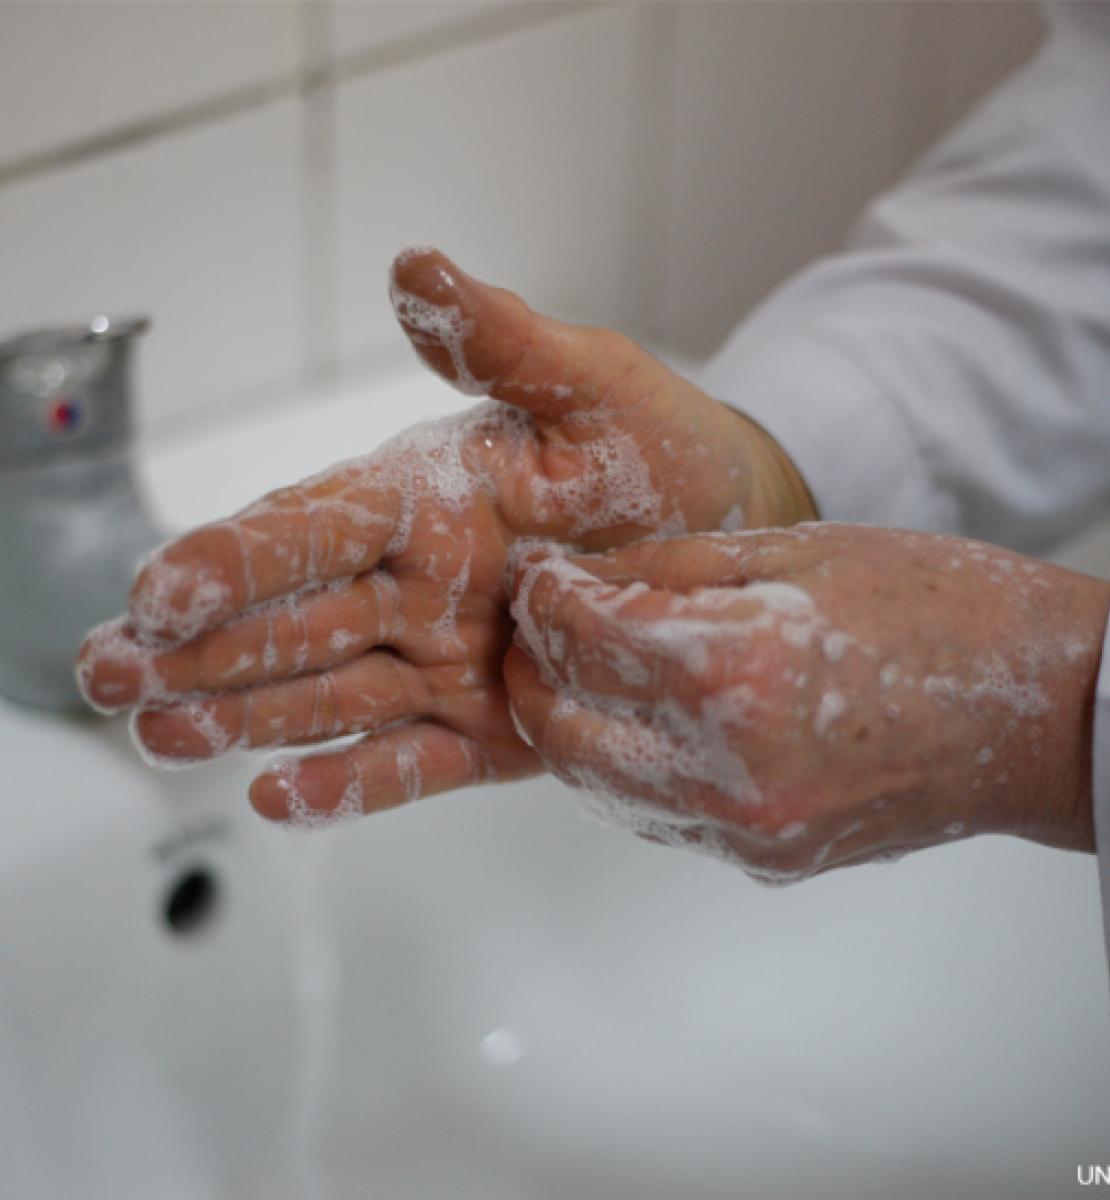 Image demonstrates proper hand washing.